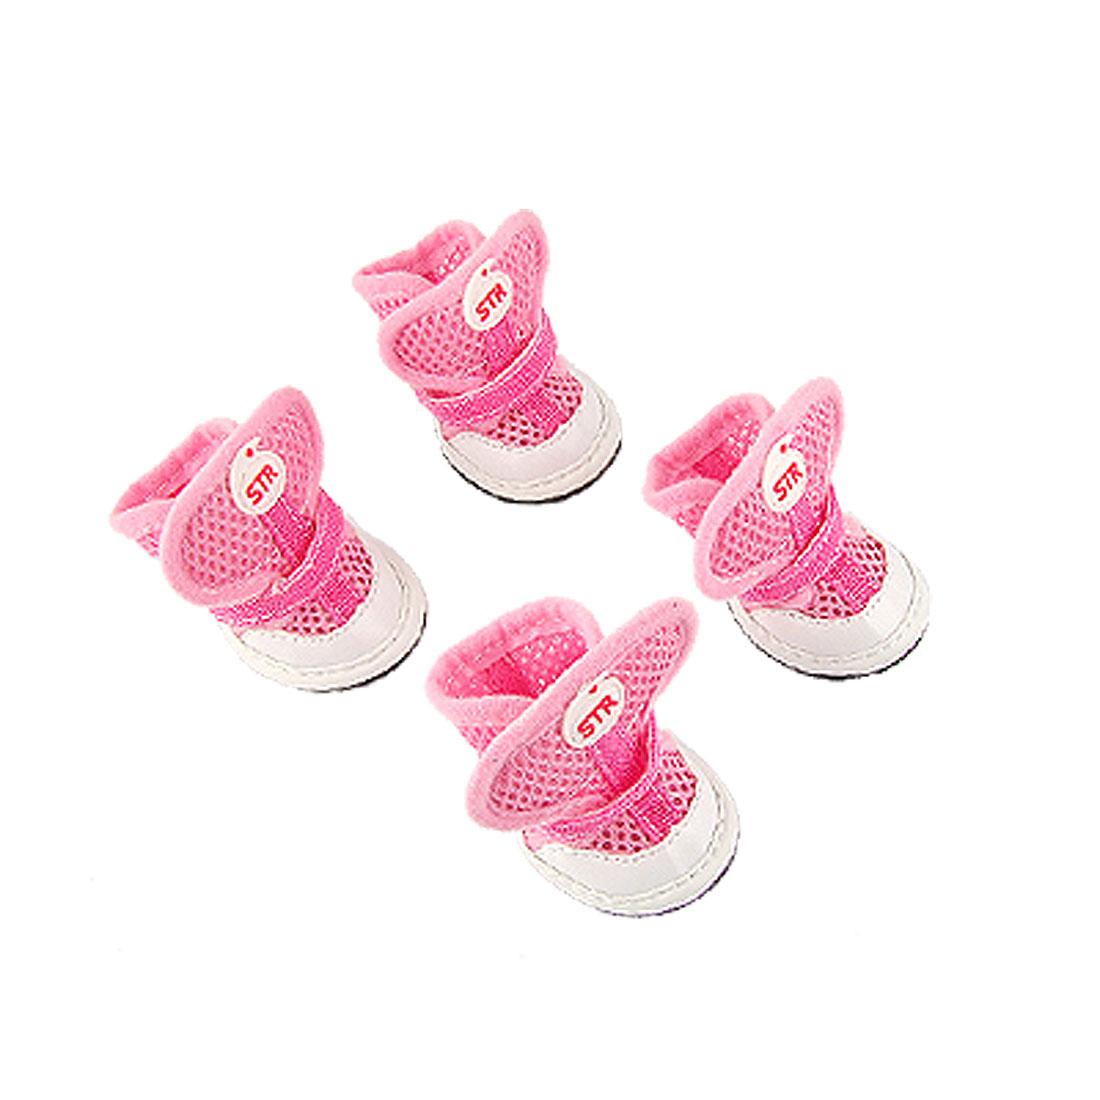 Dog Antislip Rubber Sole Adjustable Strap Air Mesh Pink Shoes 1